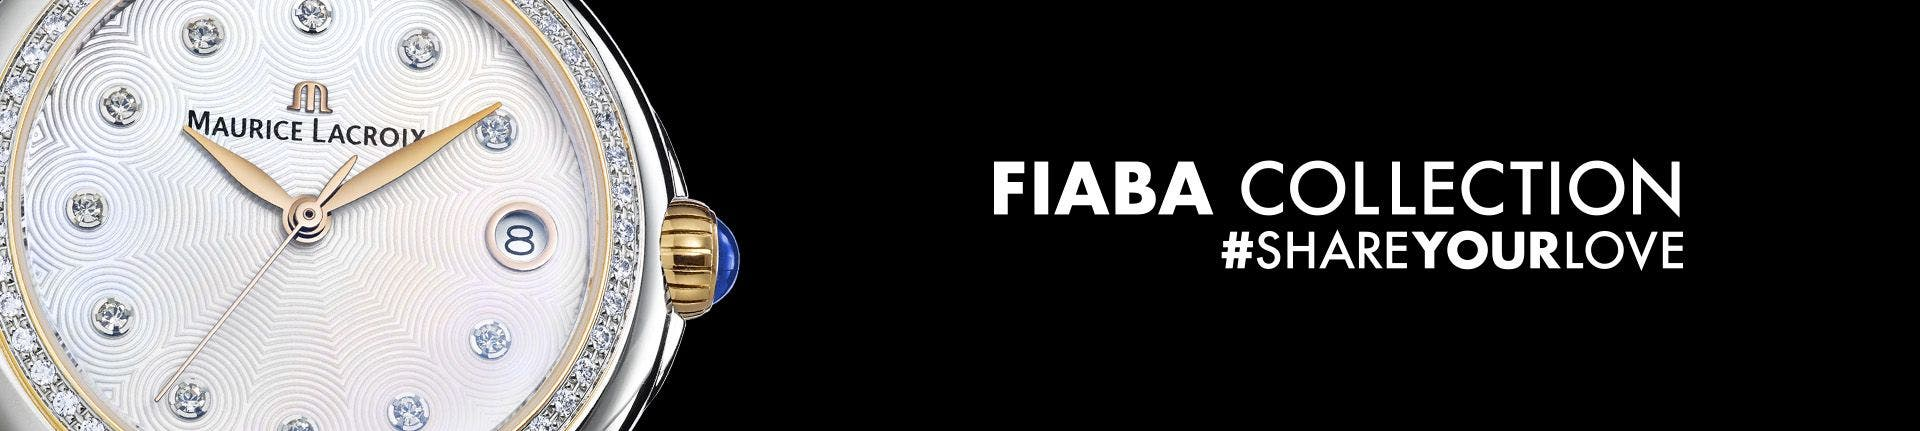 Fiaba